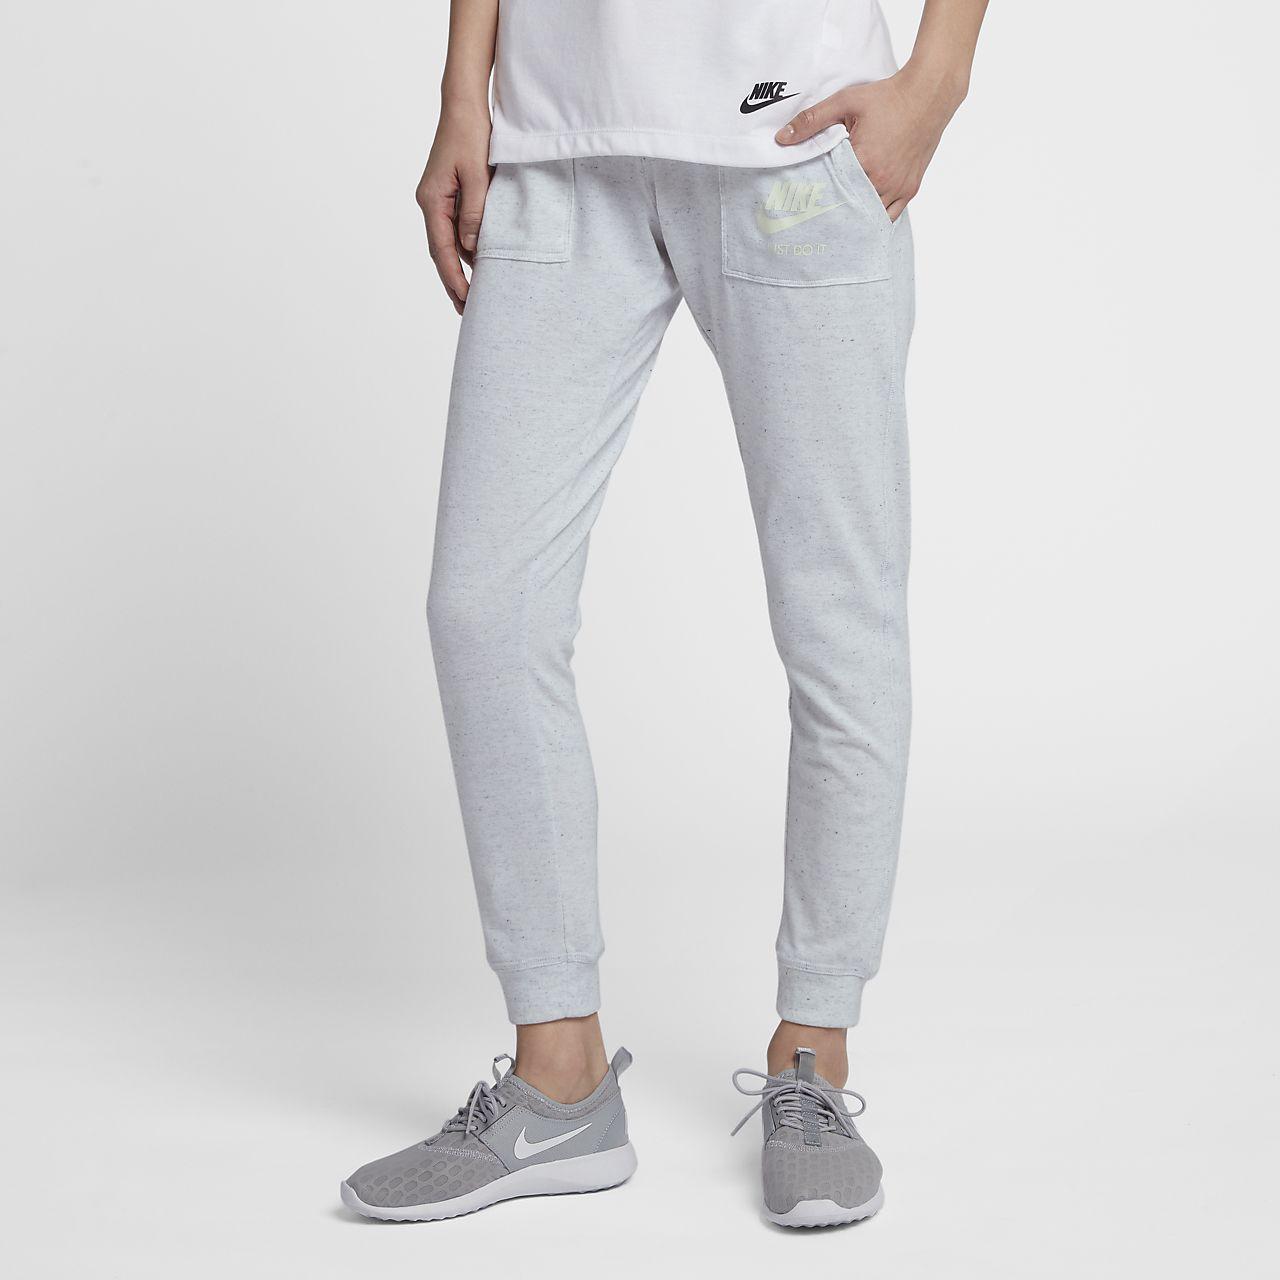 11acd0de699e5 Pantalones para mujer Nike Sportswear Gym Vintage. Nike.com CL